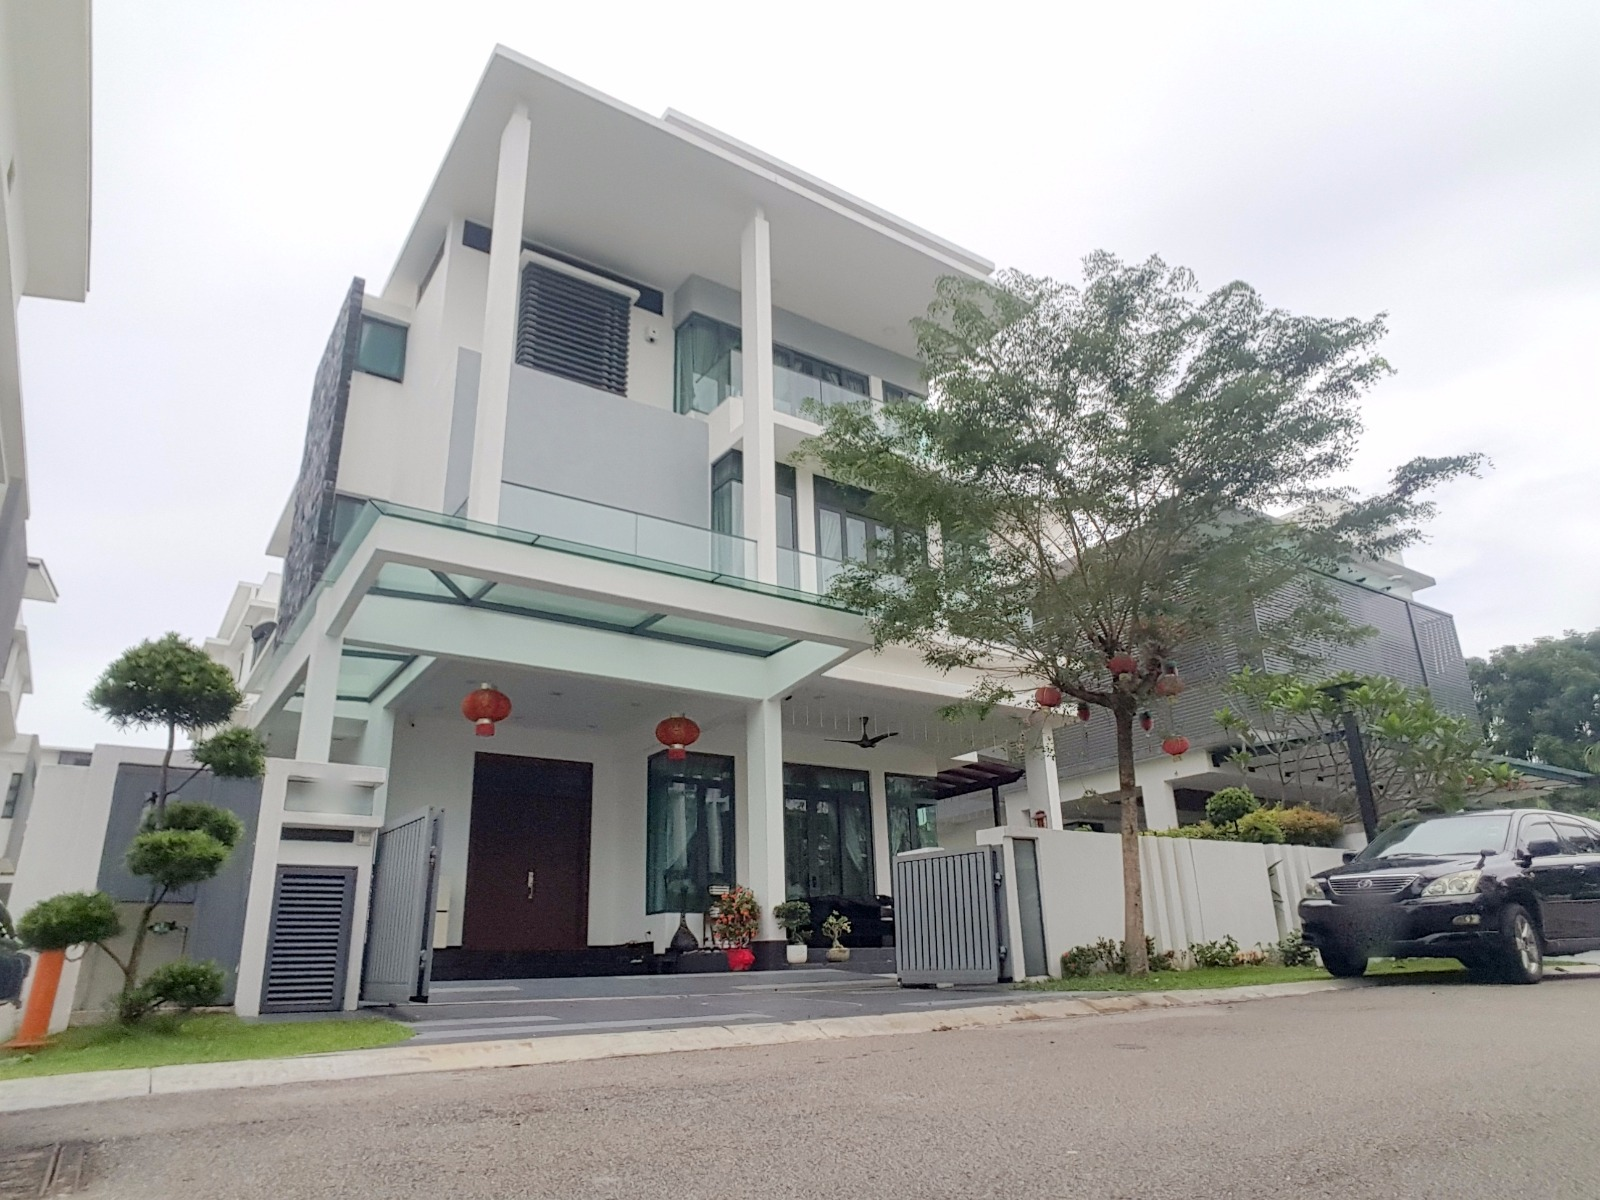 Casabella Bungalow, Kota Damansara